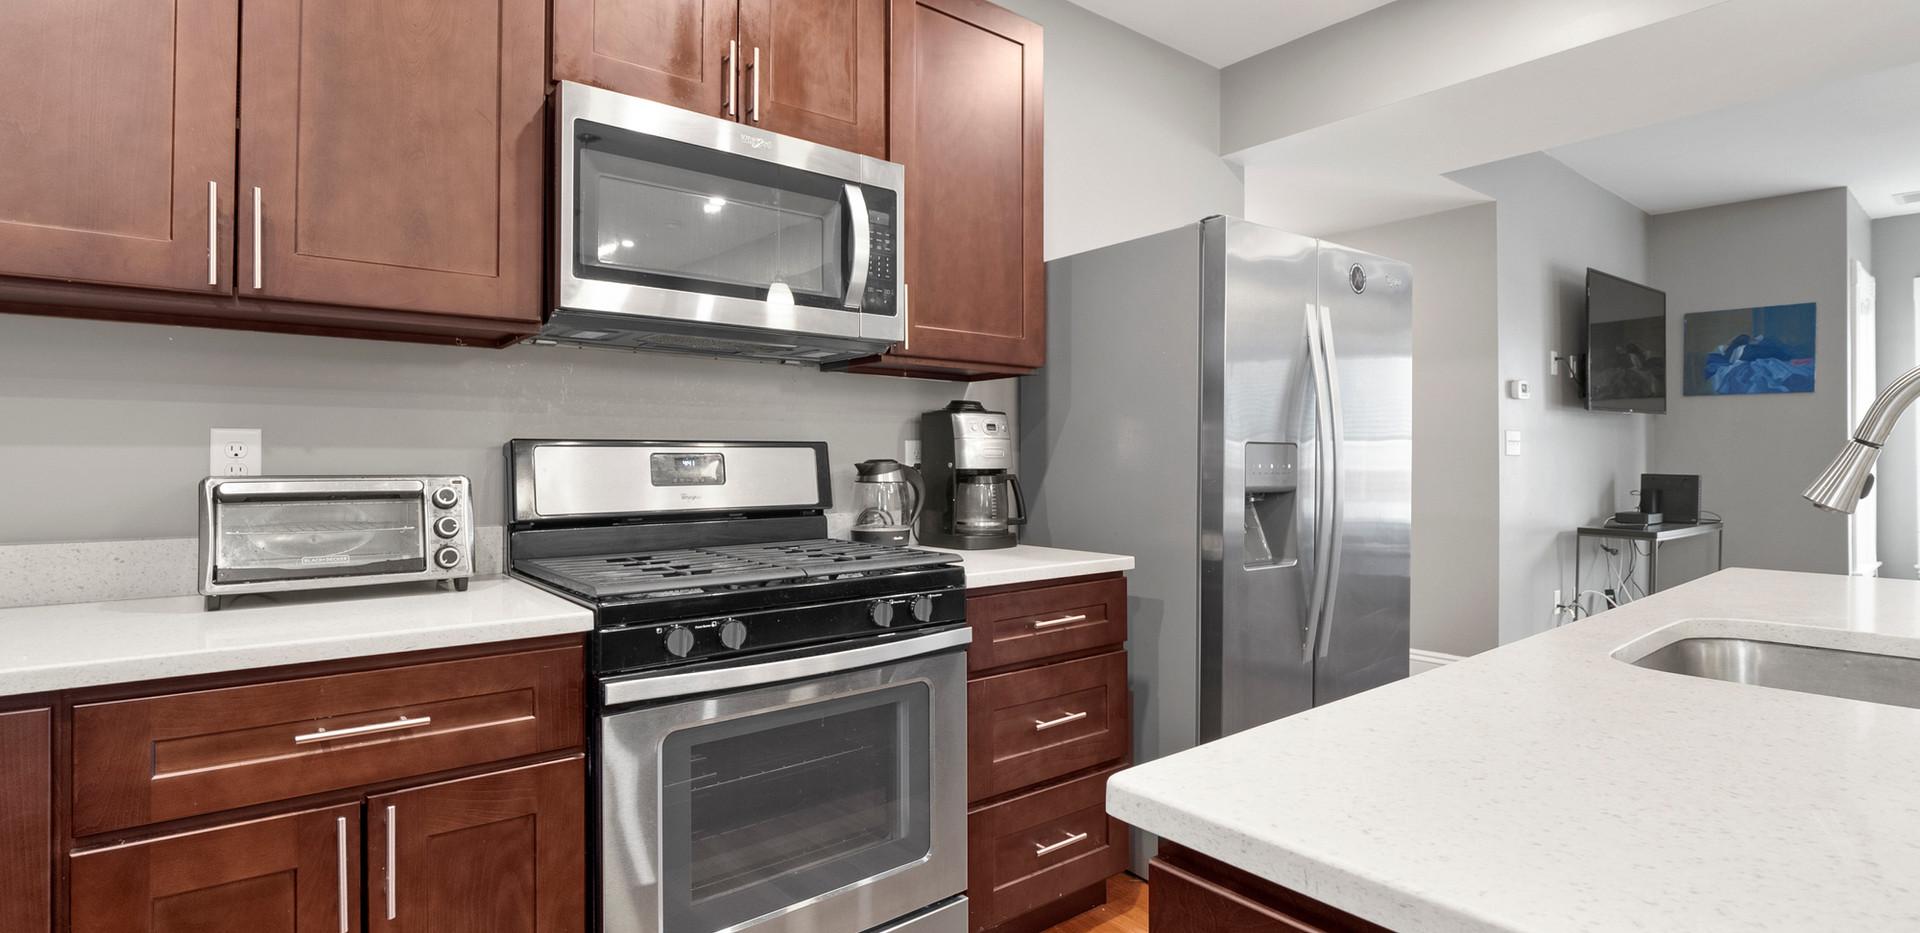 23_Washington_1_Kitchen_Photo1.jpg